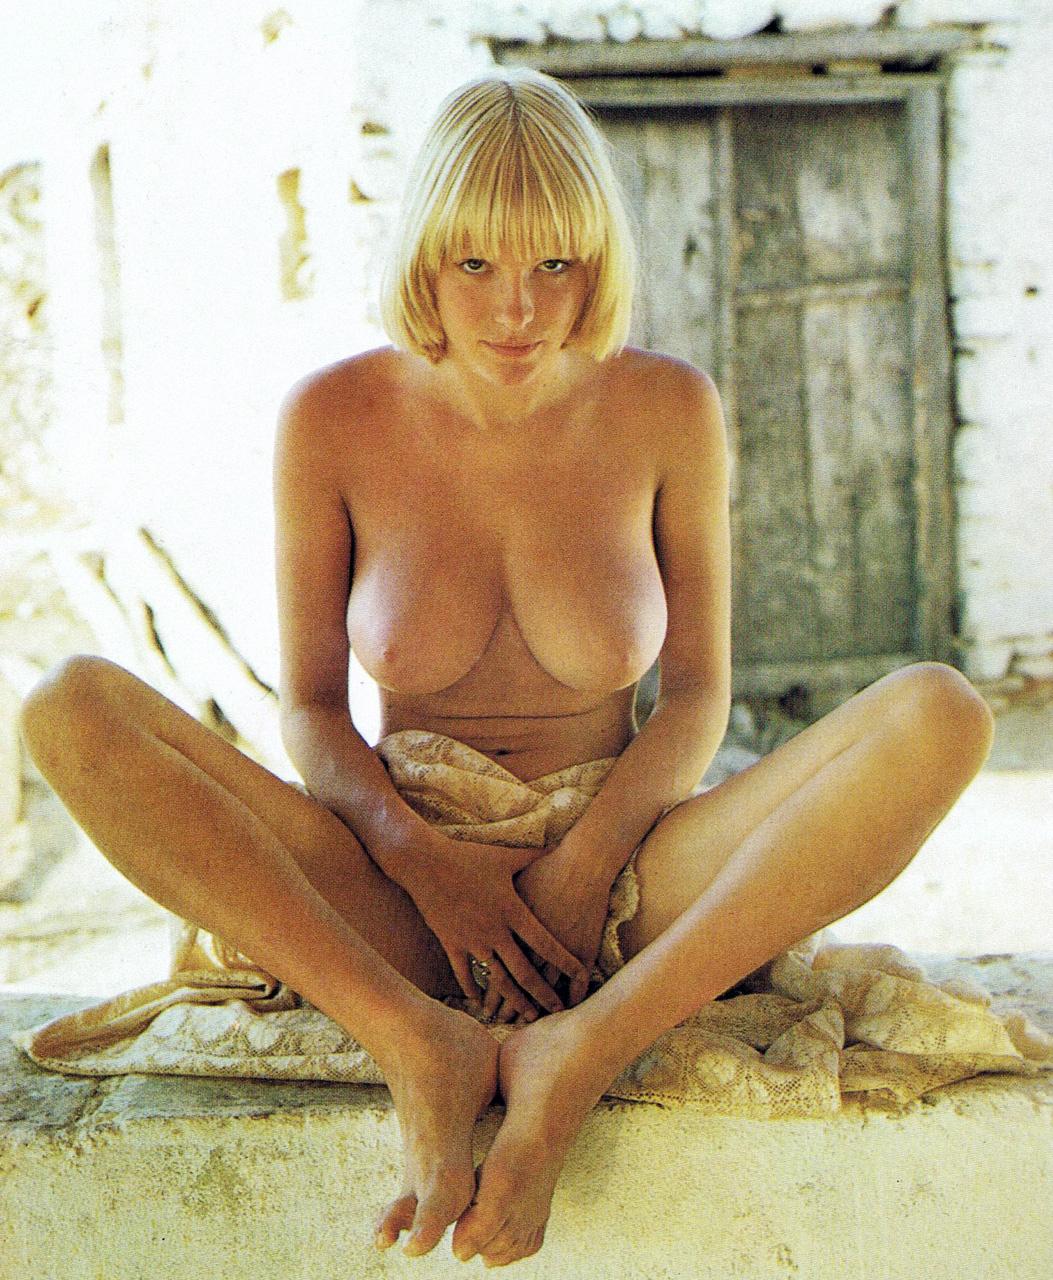 Netherland Woman Sexy Naked Image 7